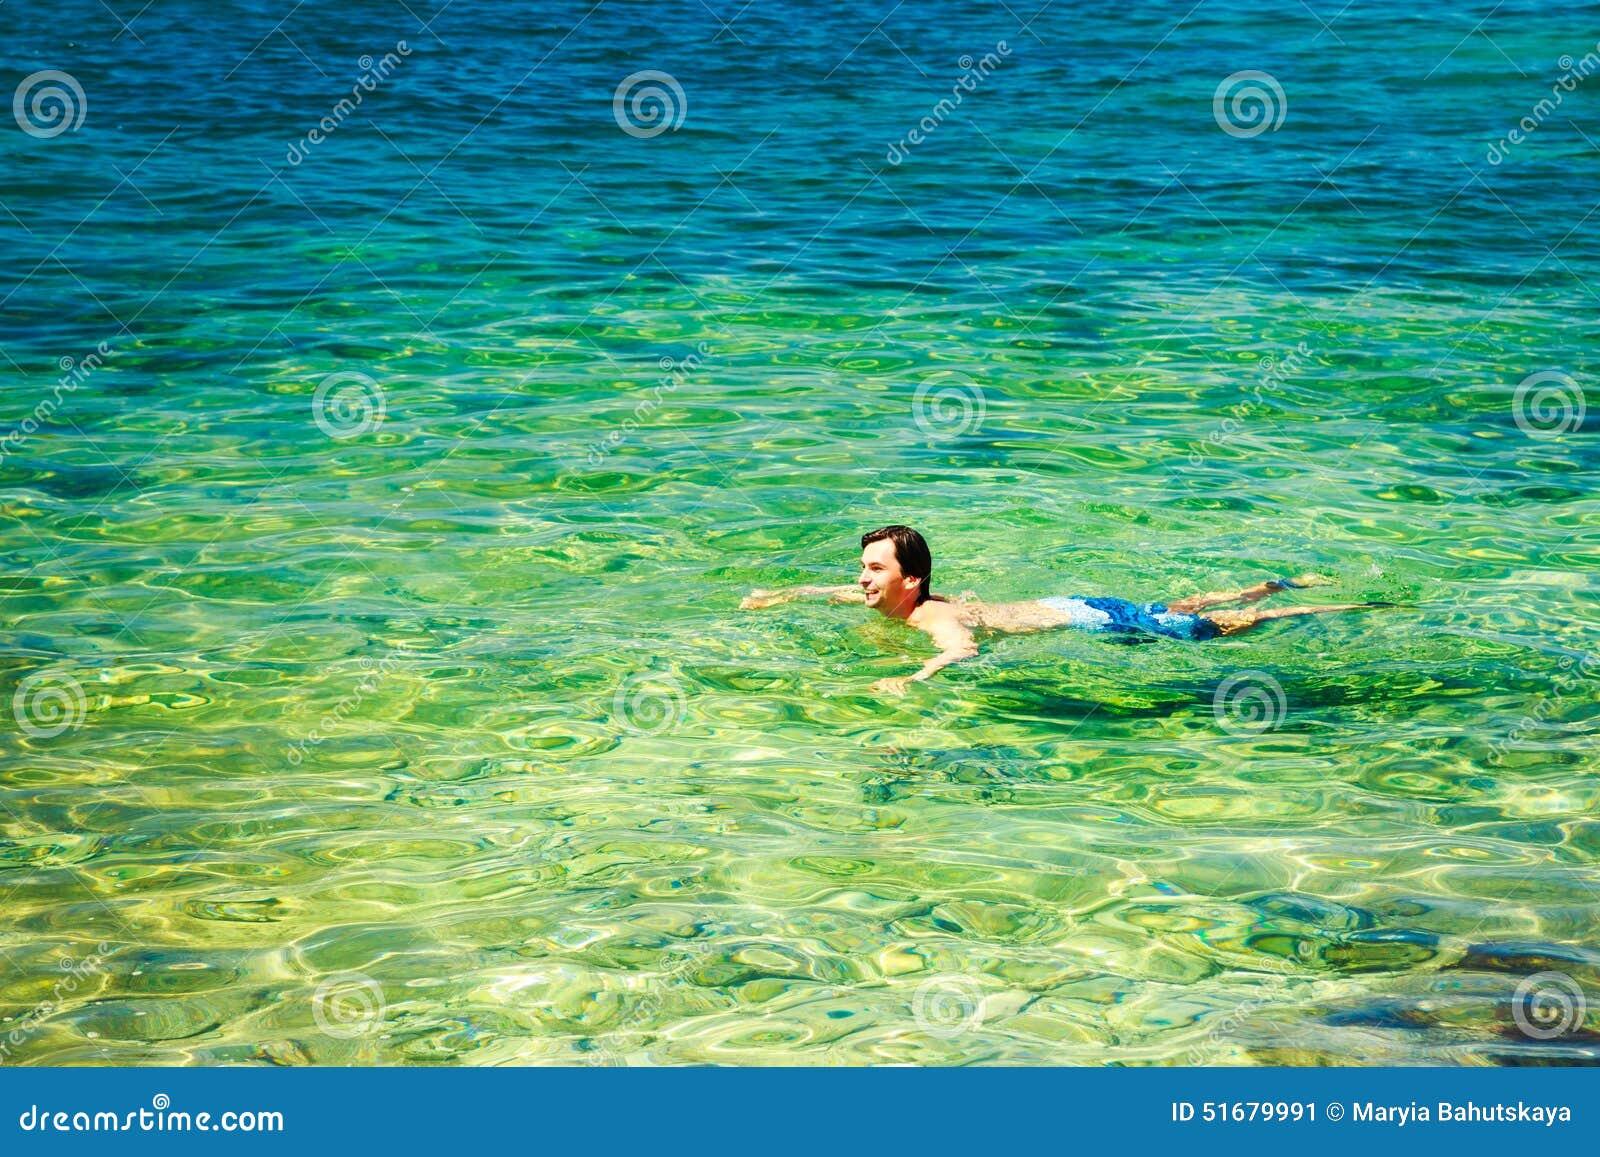 Man Swiming in Crystal Clear Sea